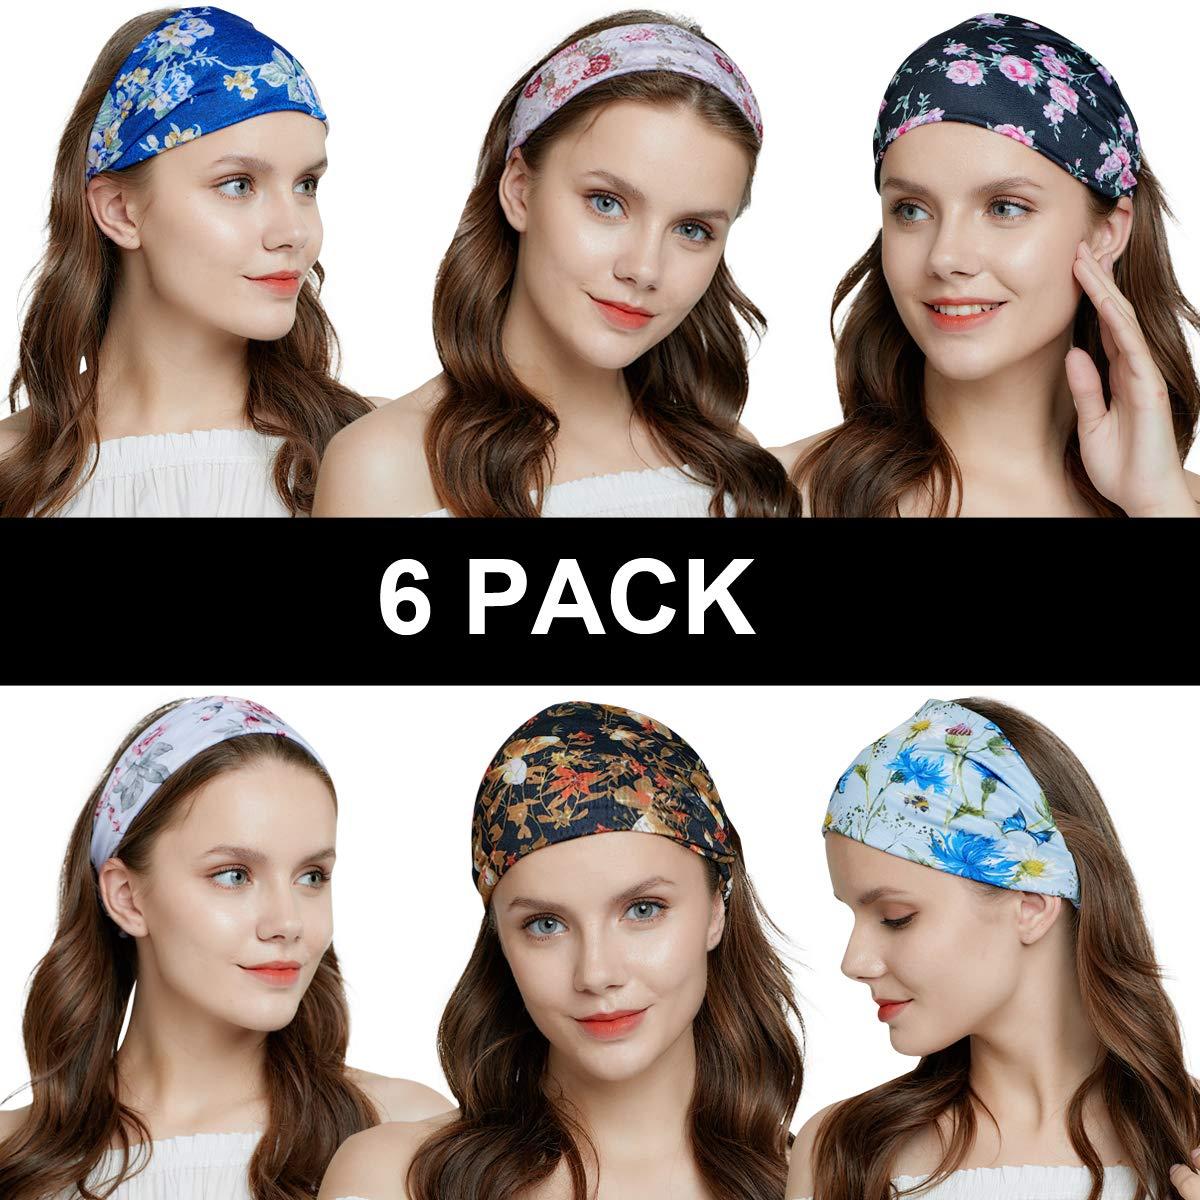 QING Headbands for Women Sweat Wicking Scarf Bandana Elastic Workout Headband Wrap Pack of 6